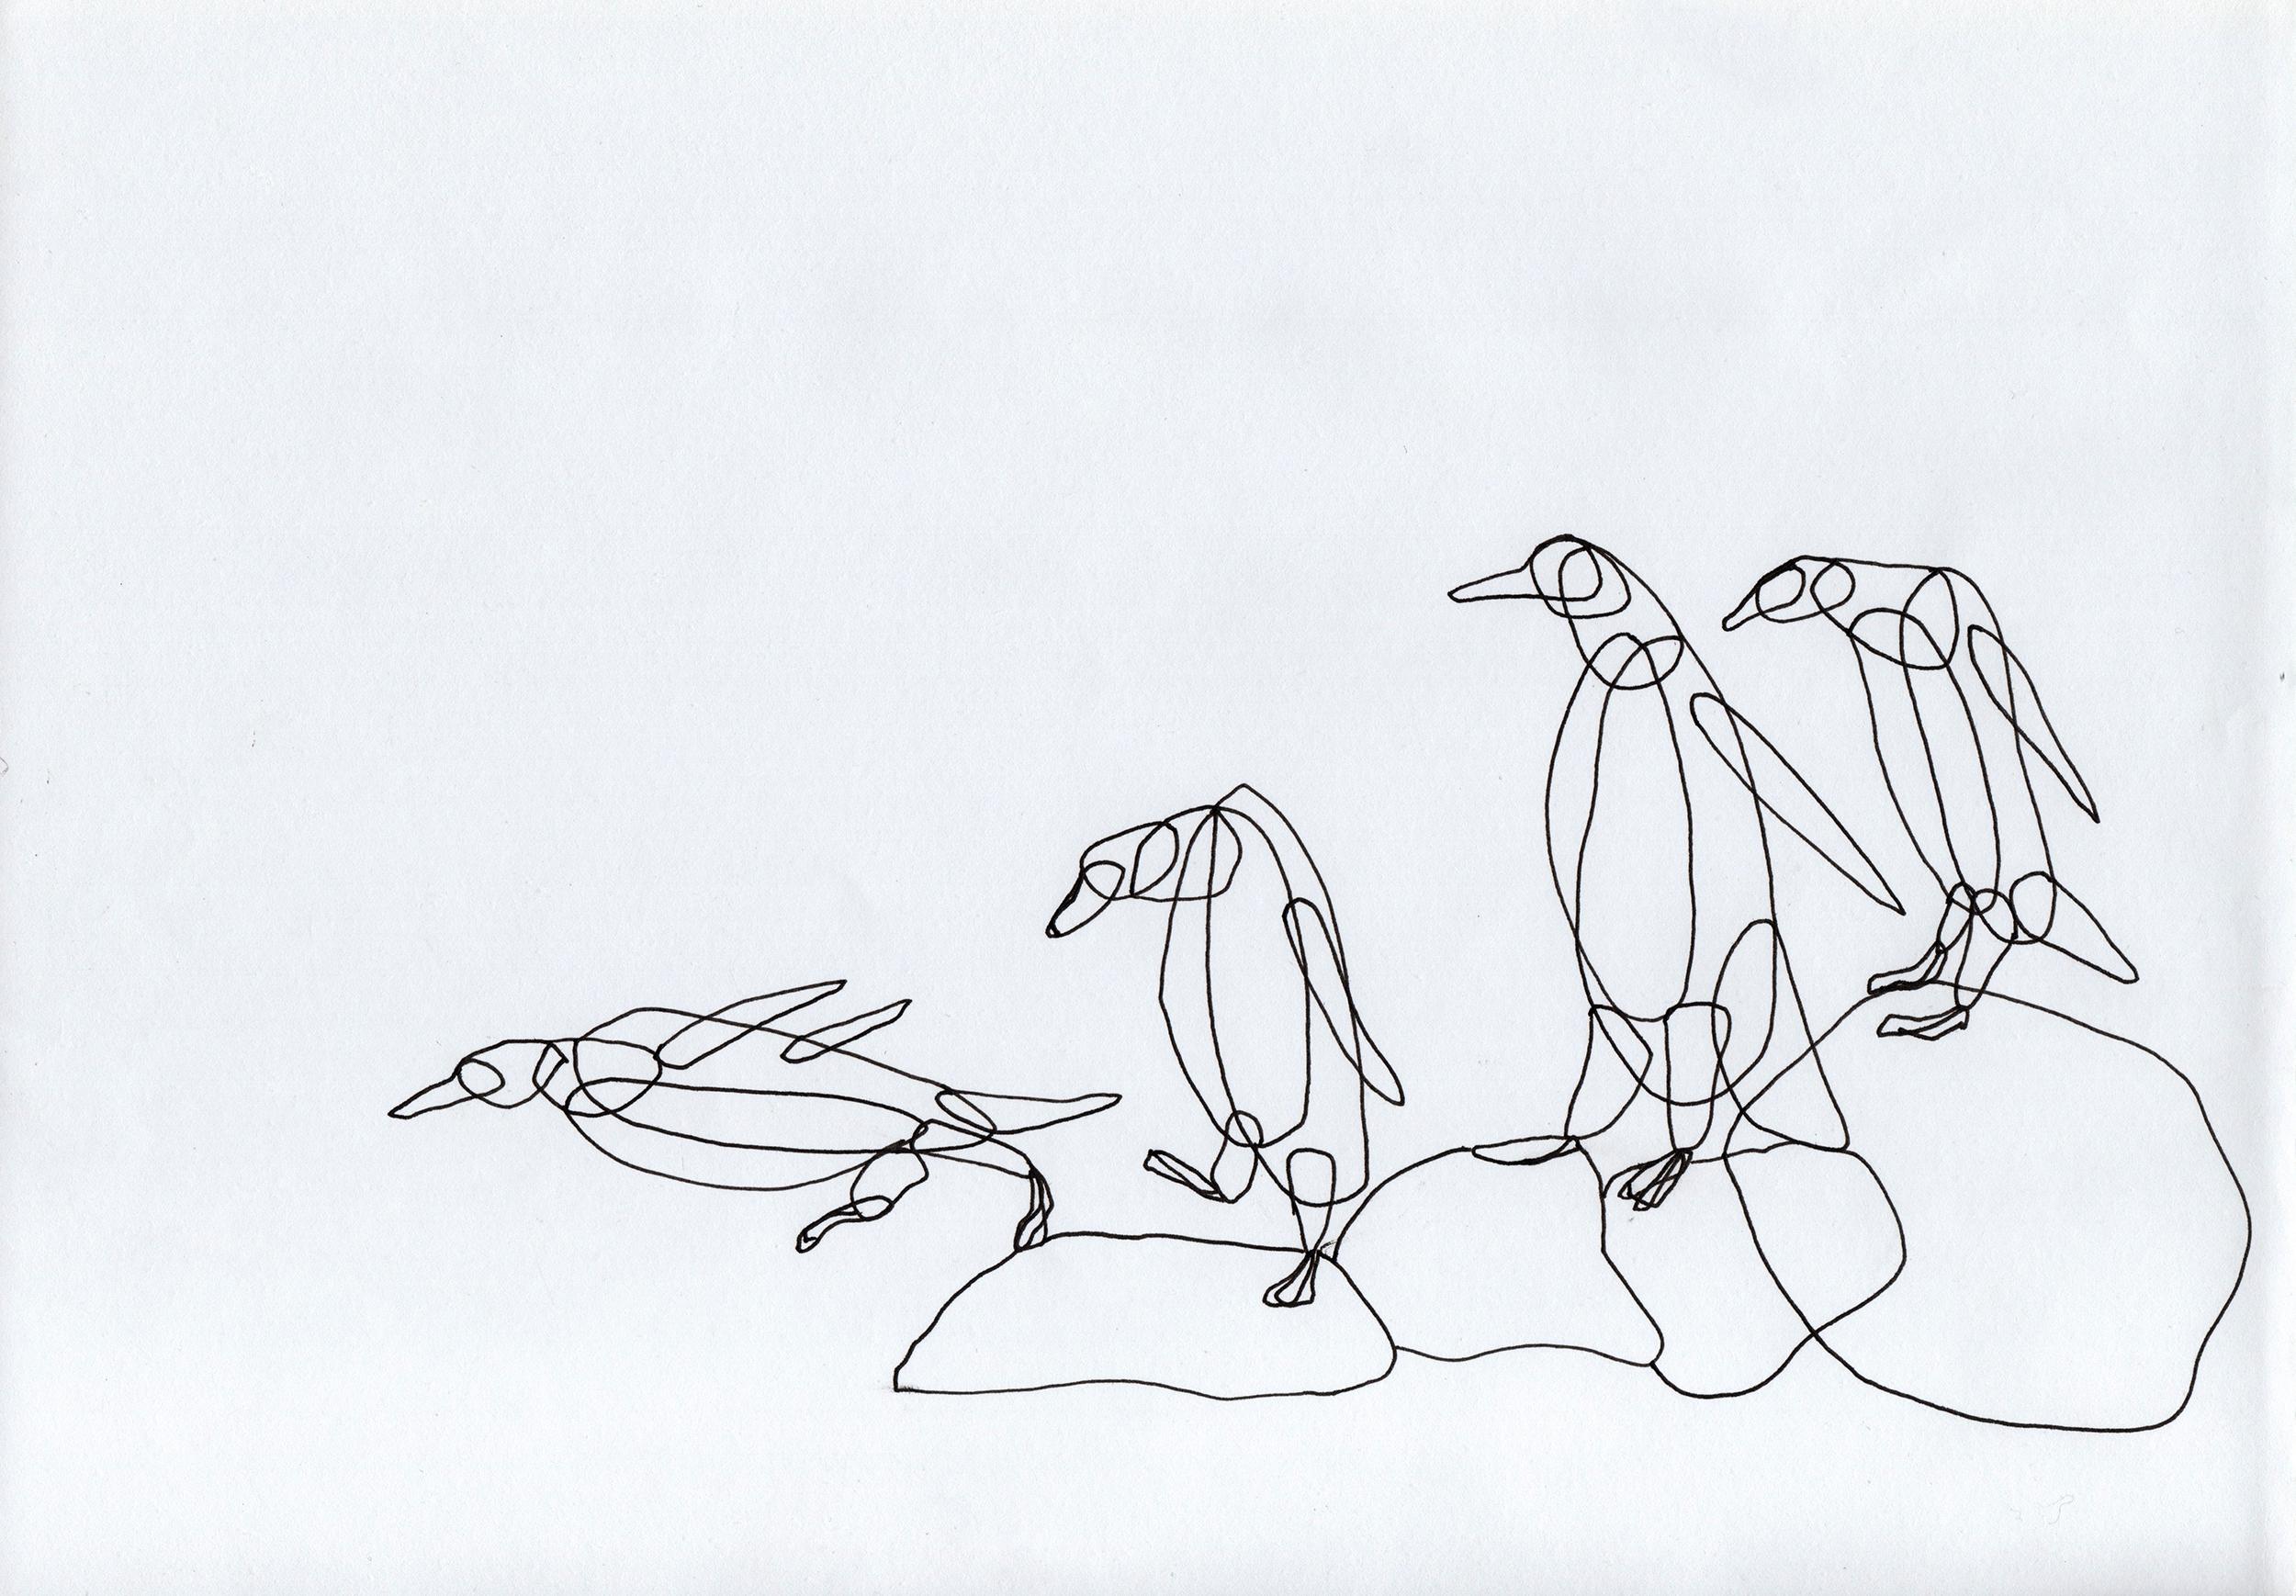 PticyLinejnye_0 28.jpg